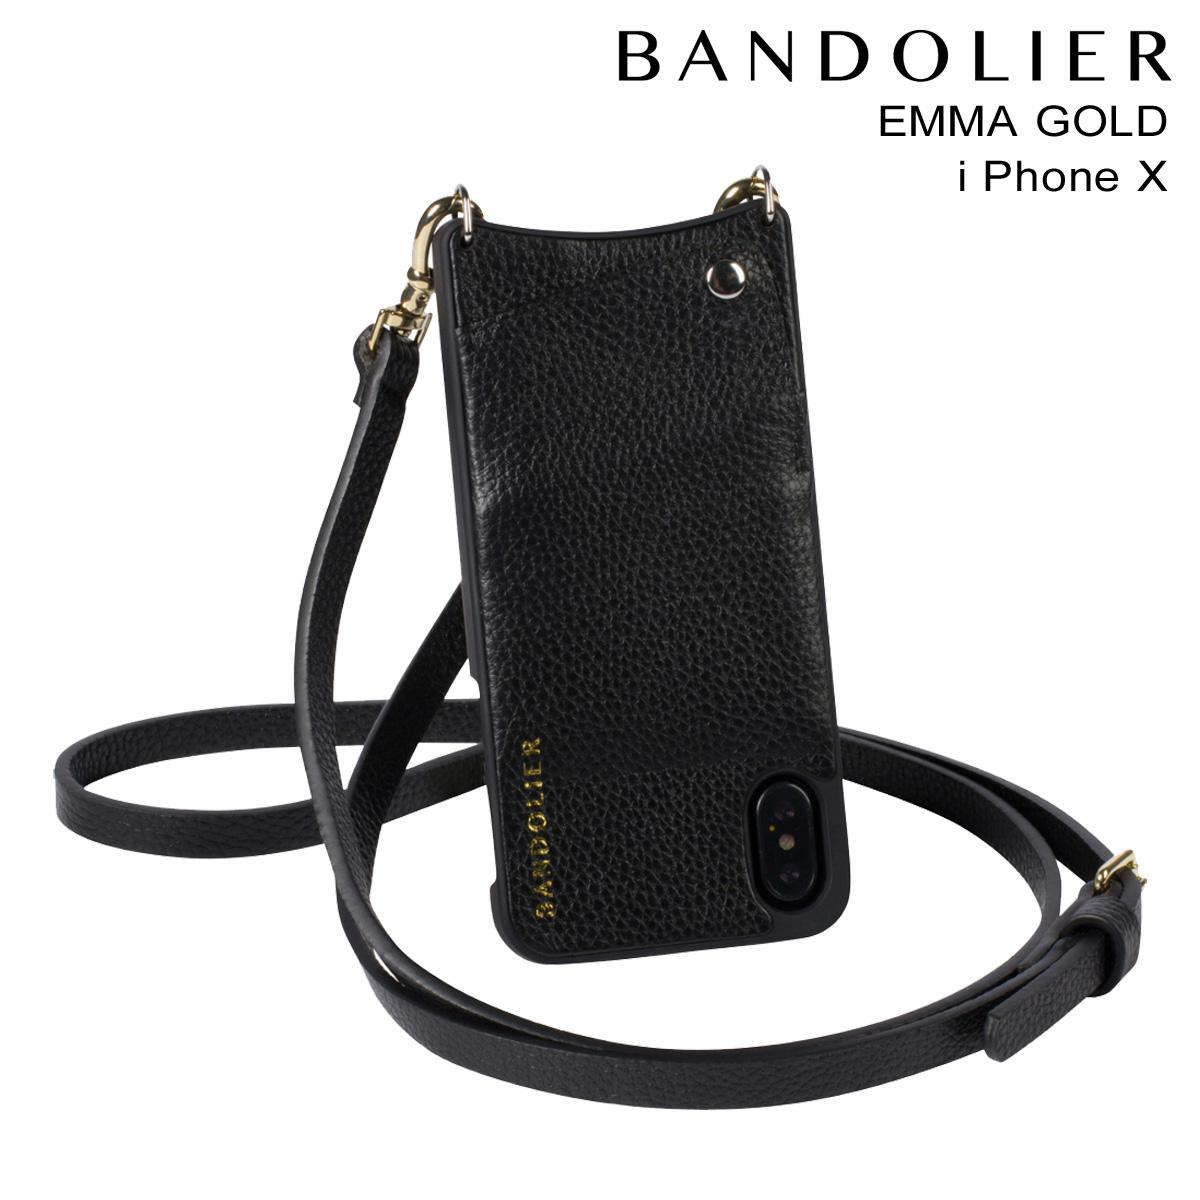 BANDOLIER EMMA GOLD バンドリヤー iPhoneX ケース スマホ アイフォン レザー メンズ レディース [191]